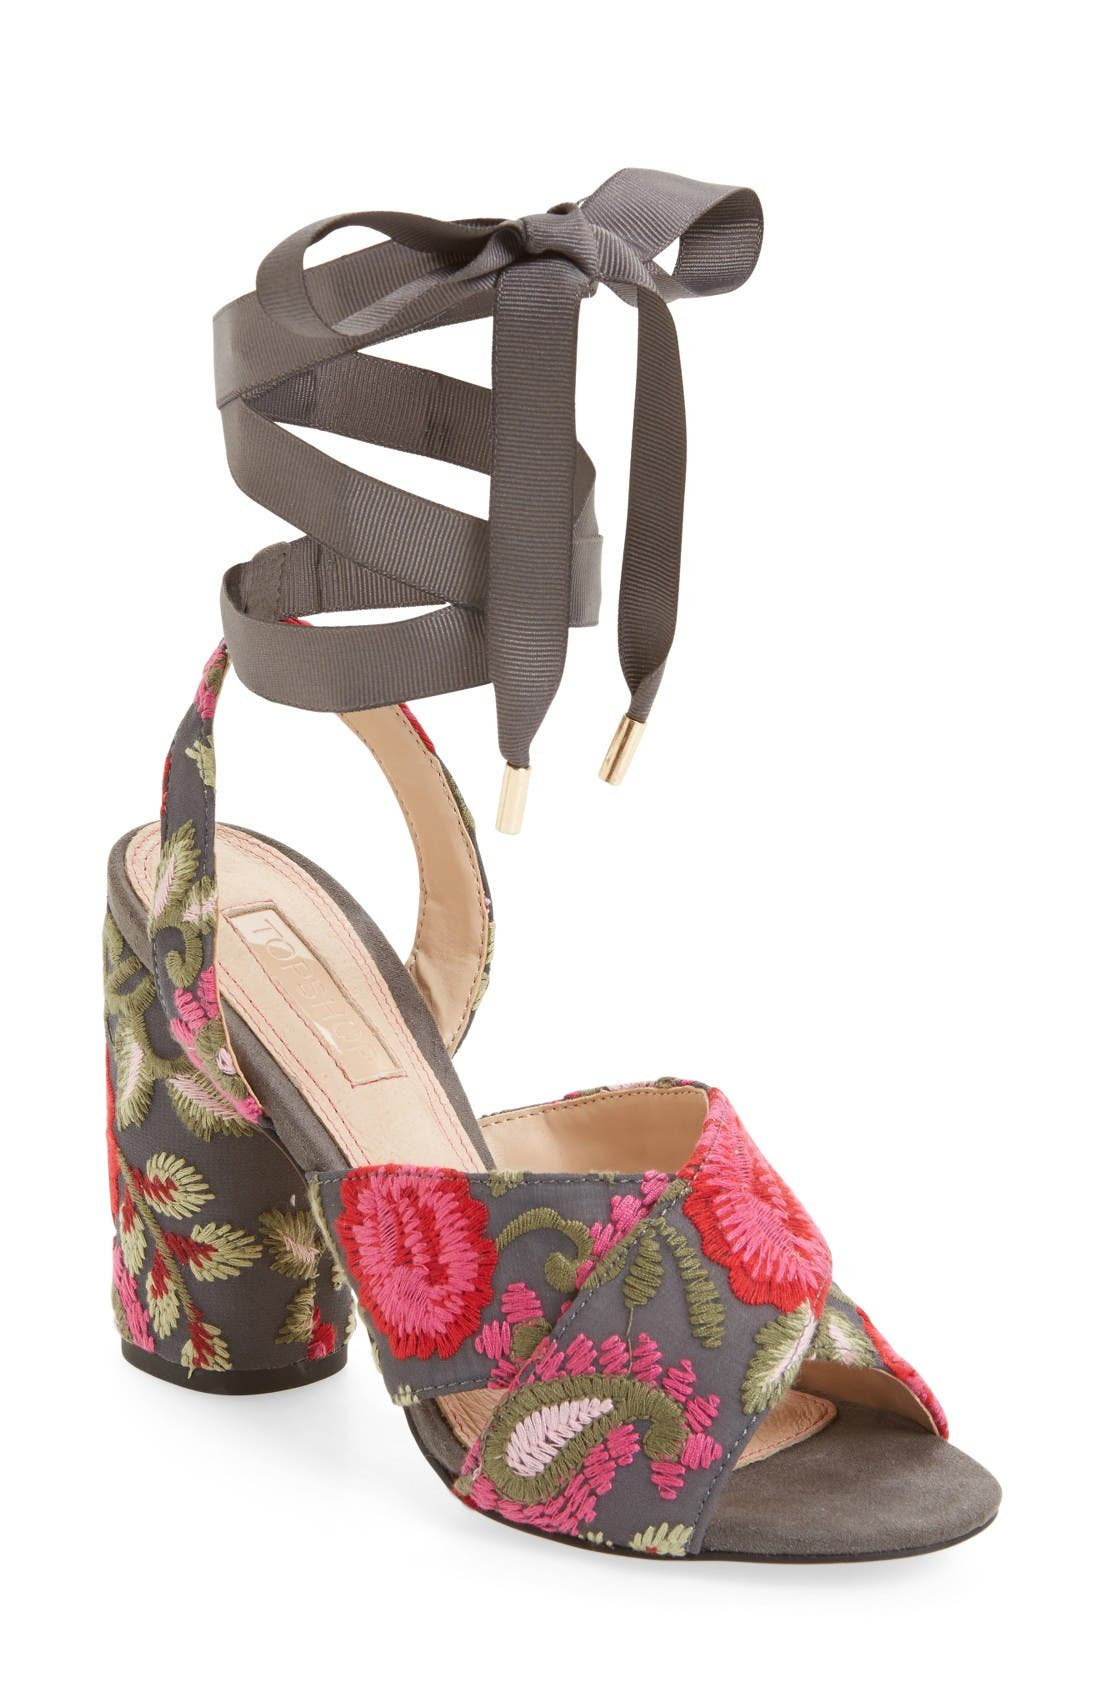 Alternate Image 1 Selected - Topshop Reena Embroidered Sandal (Women)